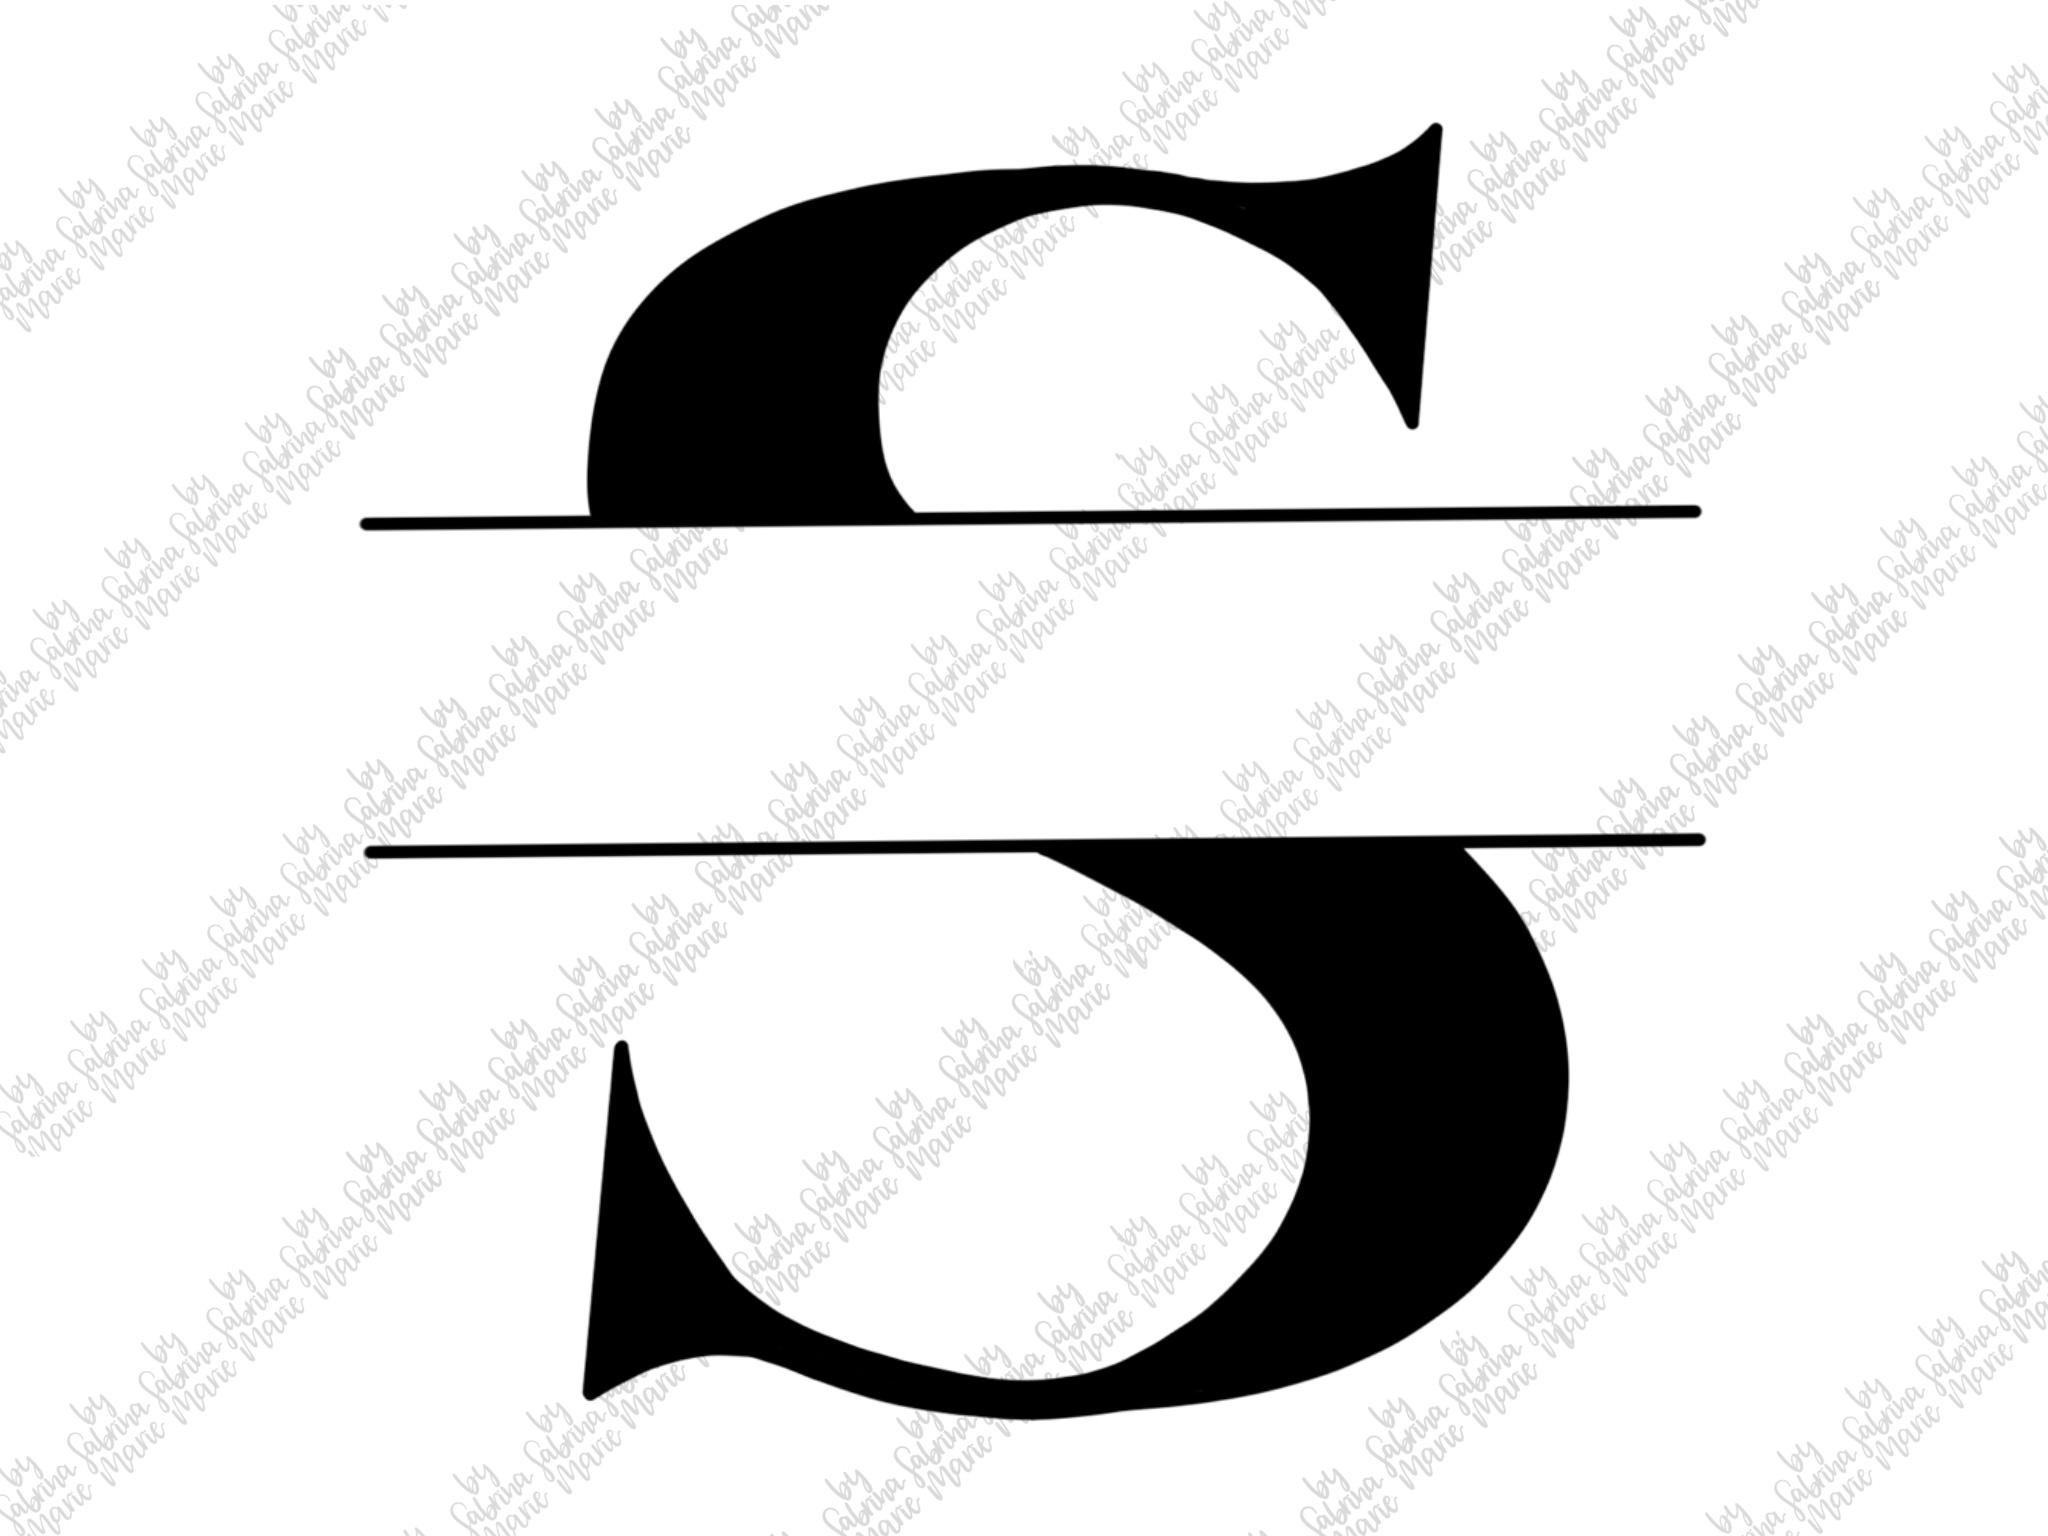 Split Monogram S - Handdrawn - SVG/PNG example image 2